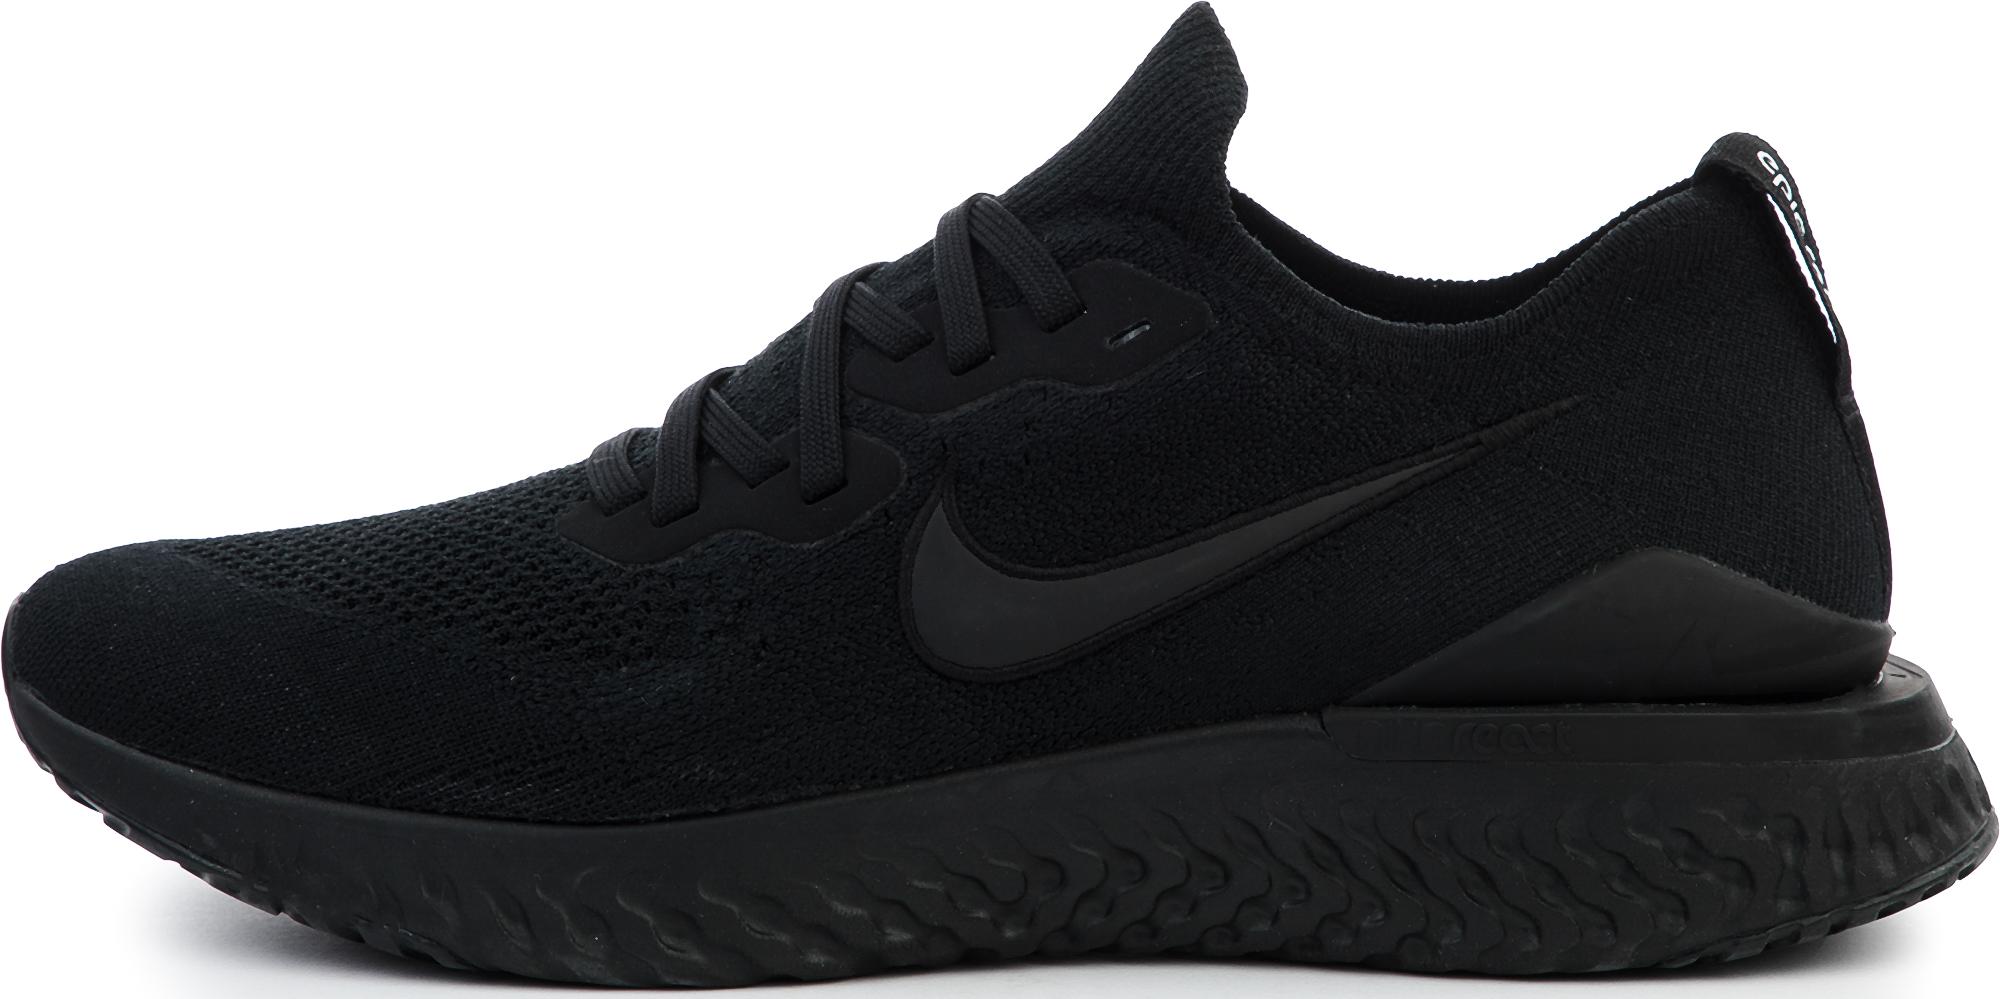 Nike Кроссовки мужские Nike Epic React Flyknit 2, размер 43